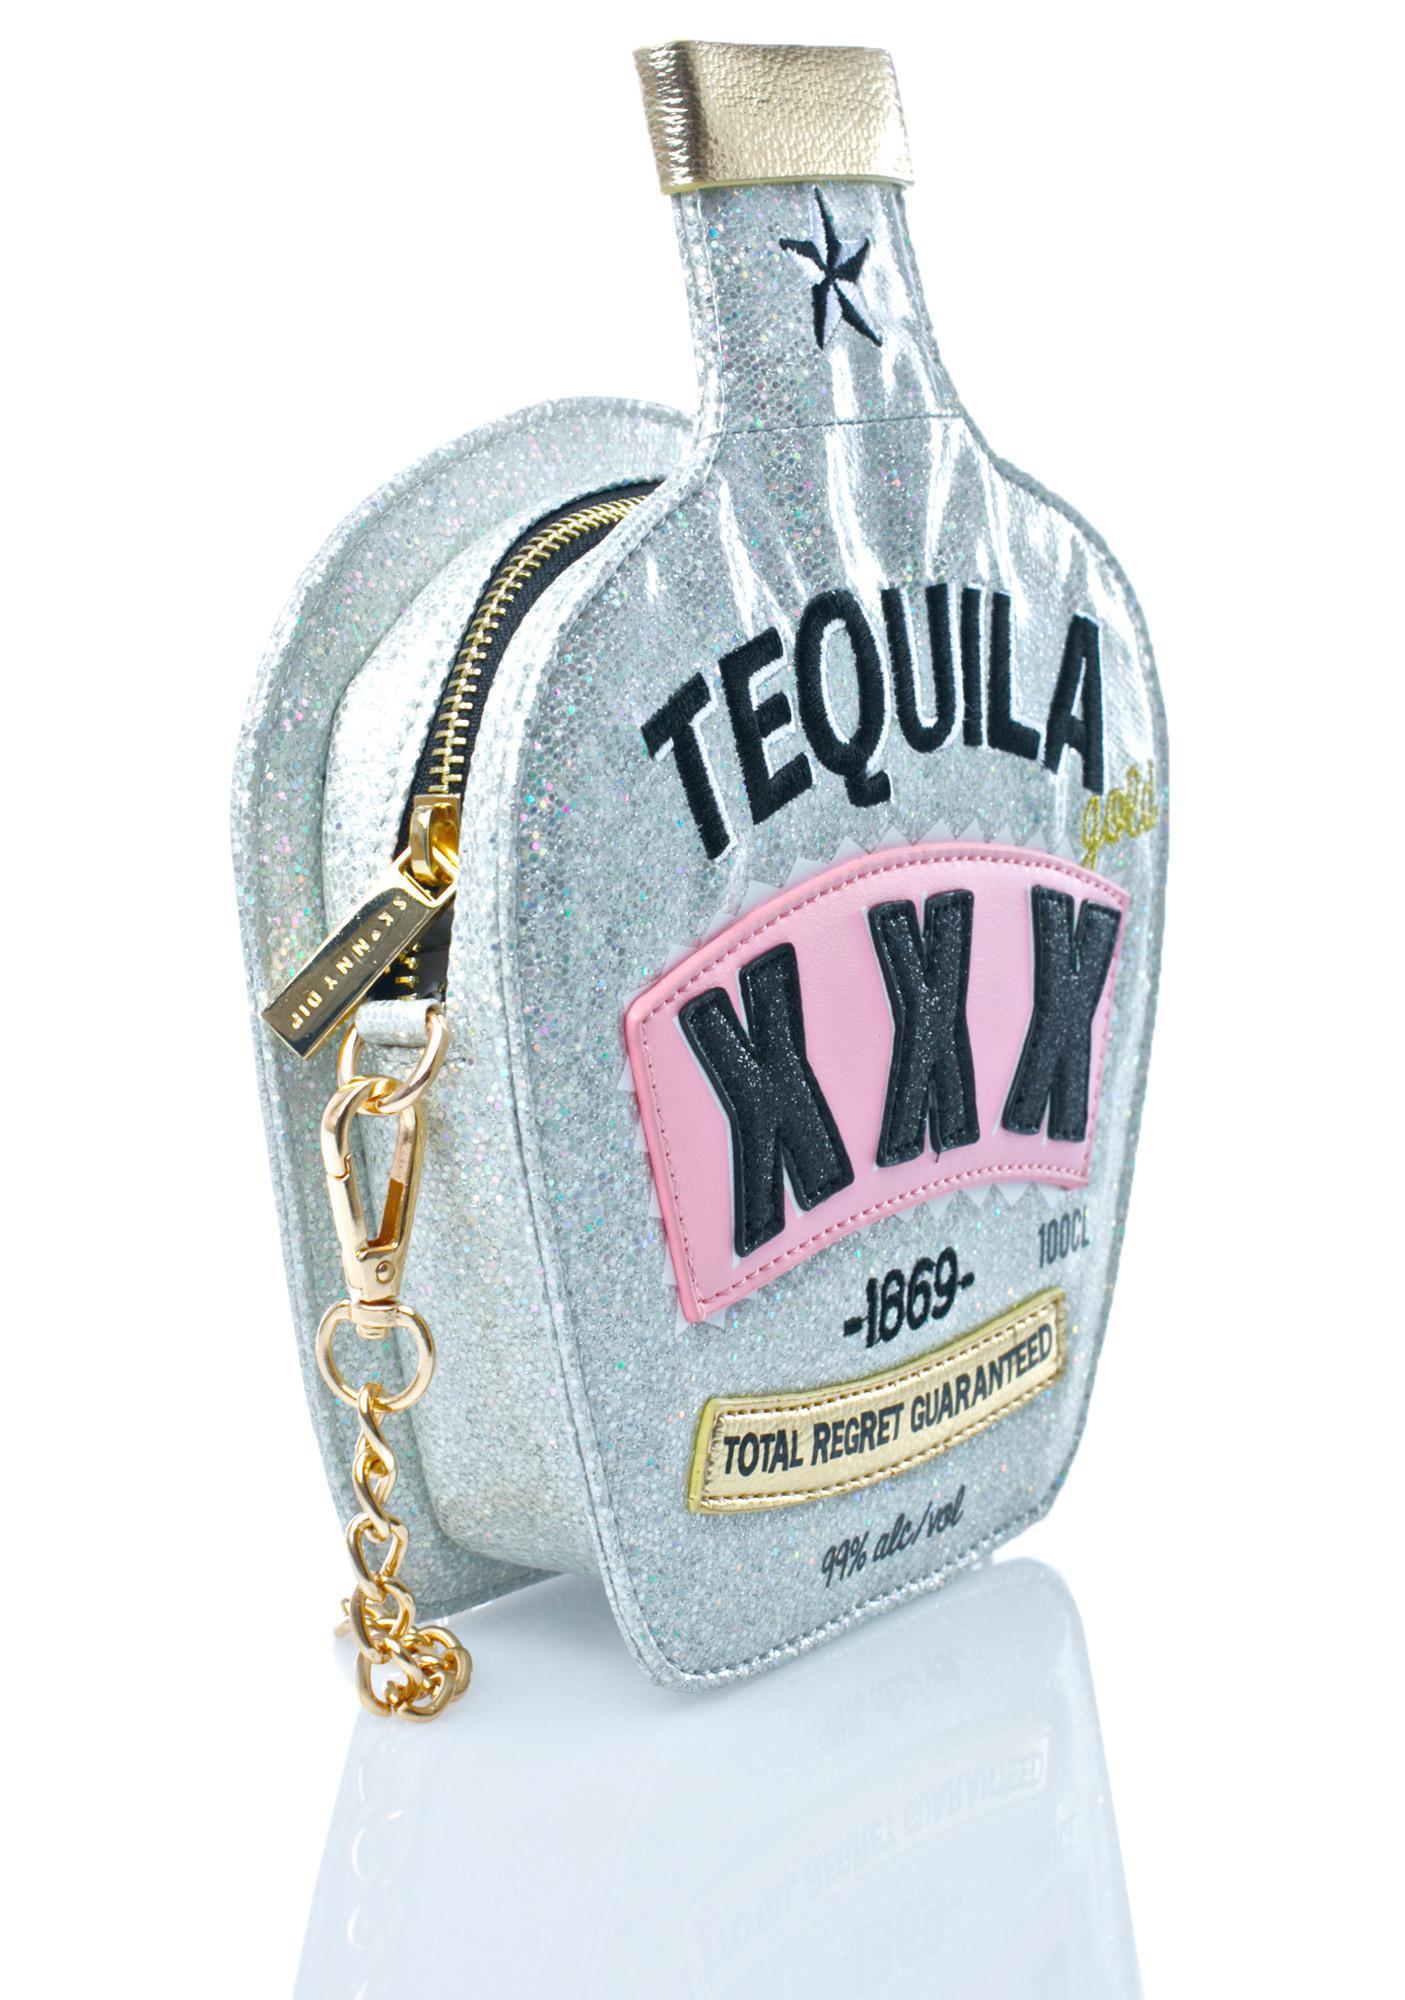 Skinnydip Tequila Cross Body Bag